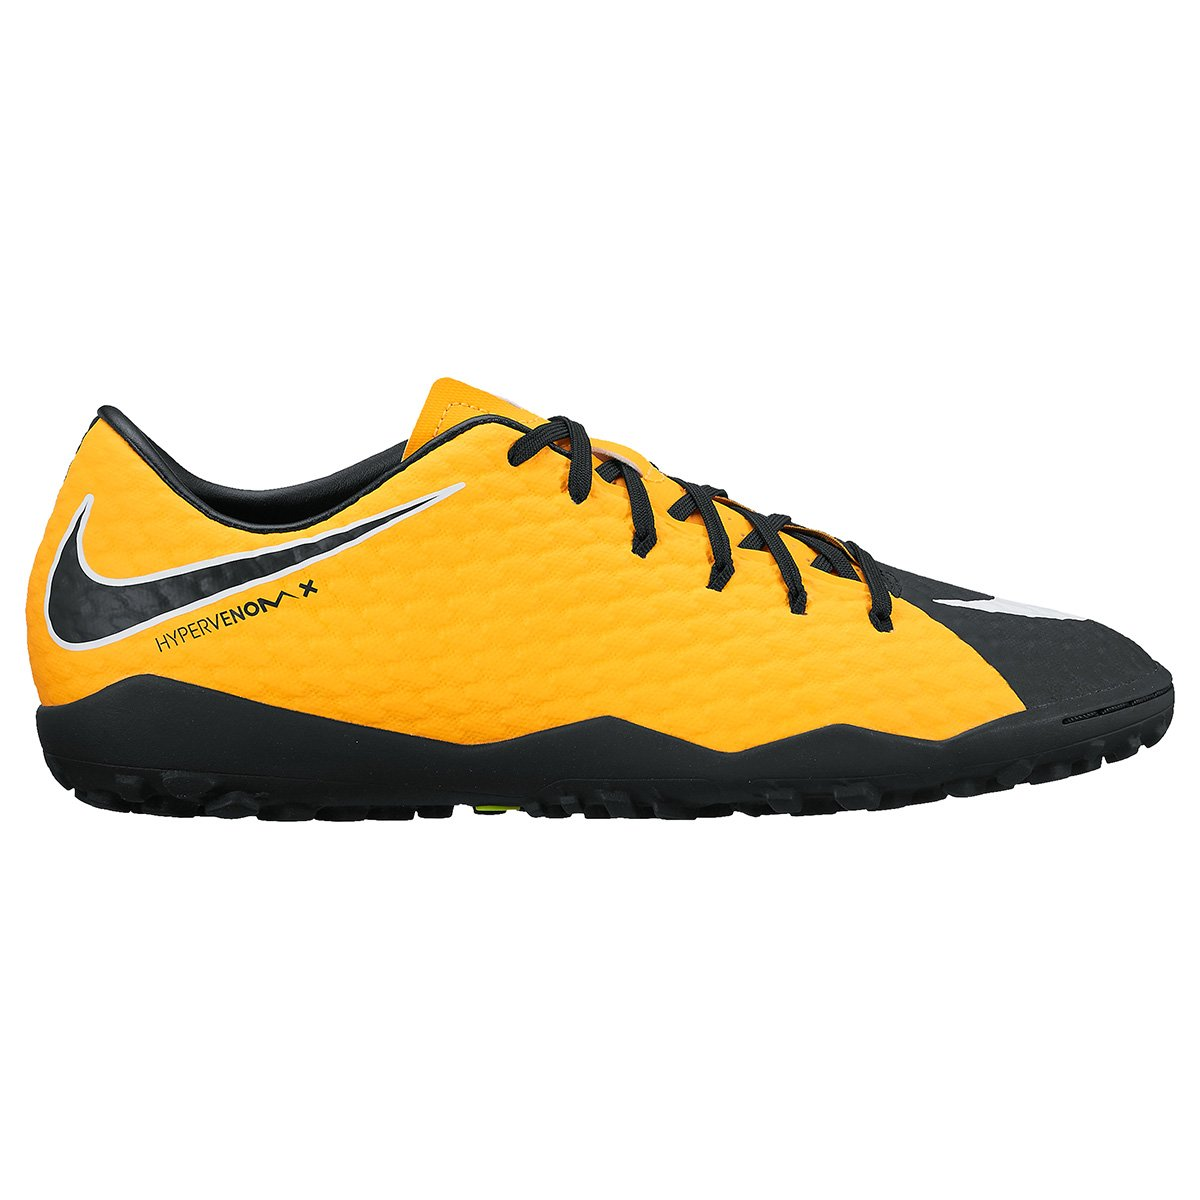 Chuteira Society Nike Hypervenom Phelon 3 TF - Compre Agora  72bbca6eec032